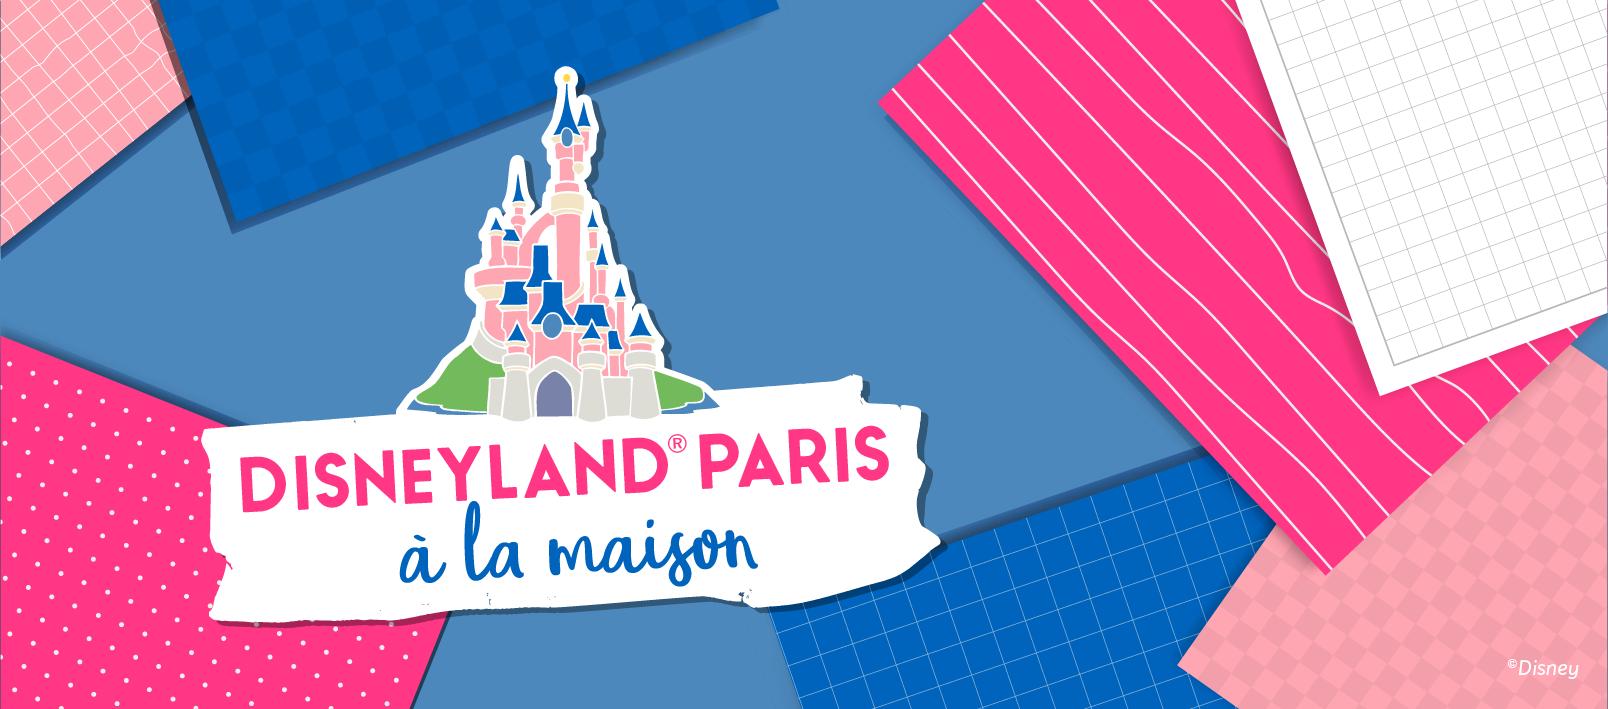 200406-DisneylandParisALaMaison-bandeau_FR